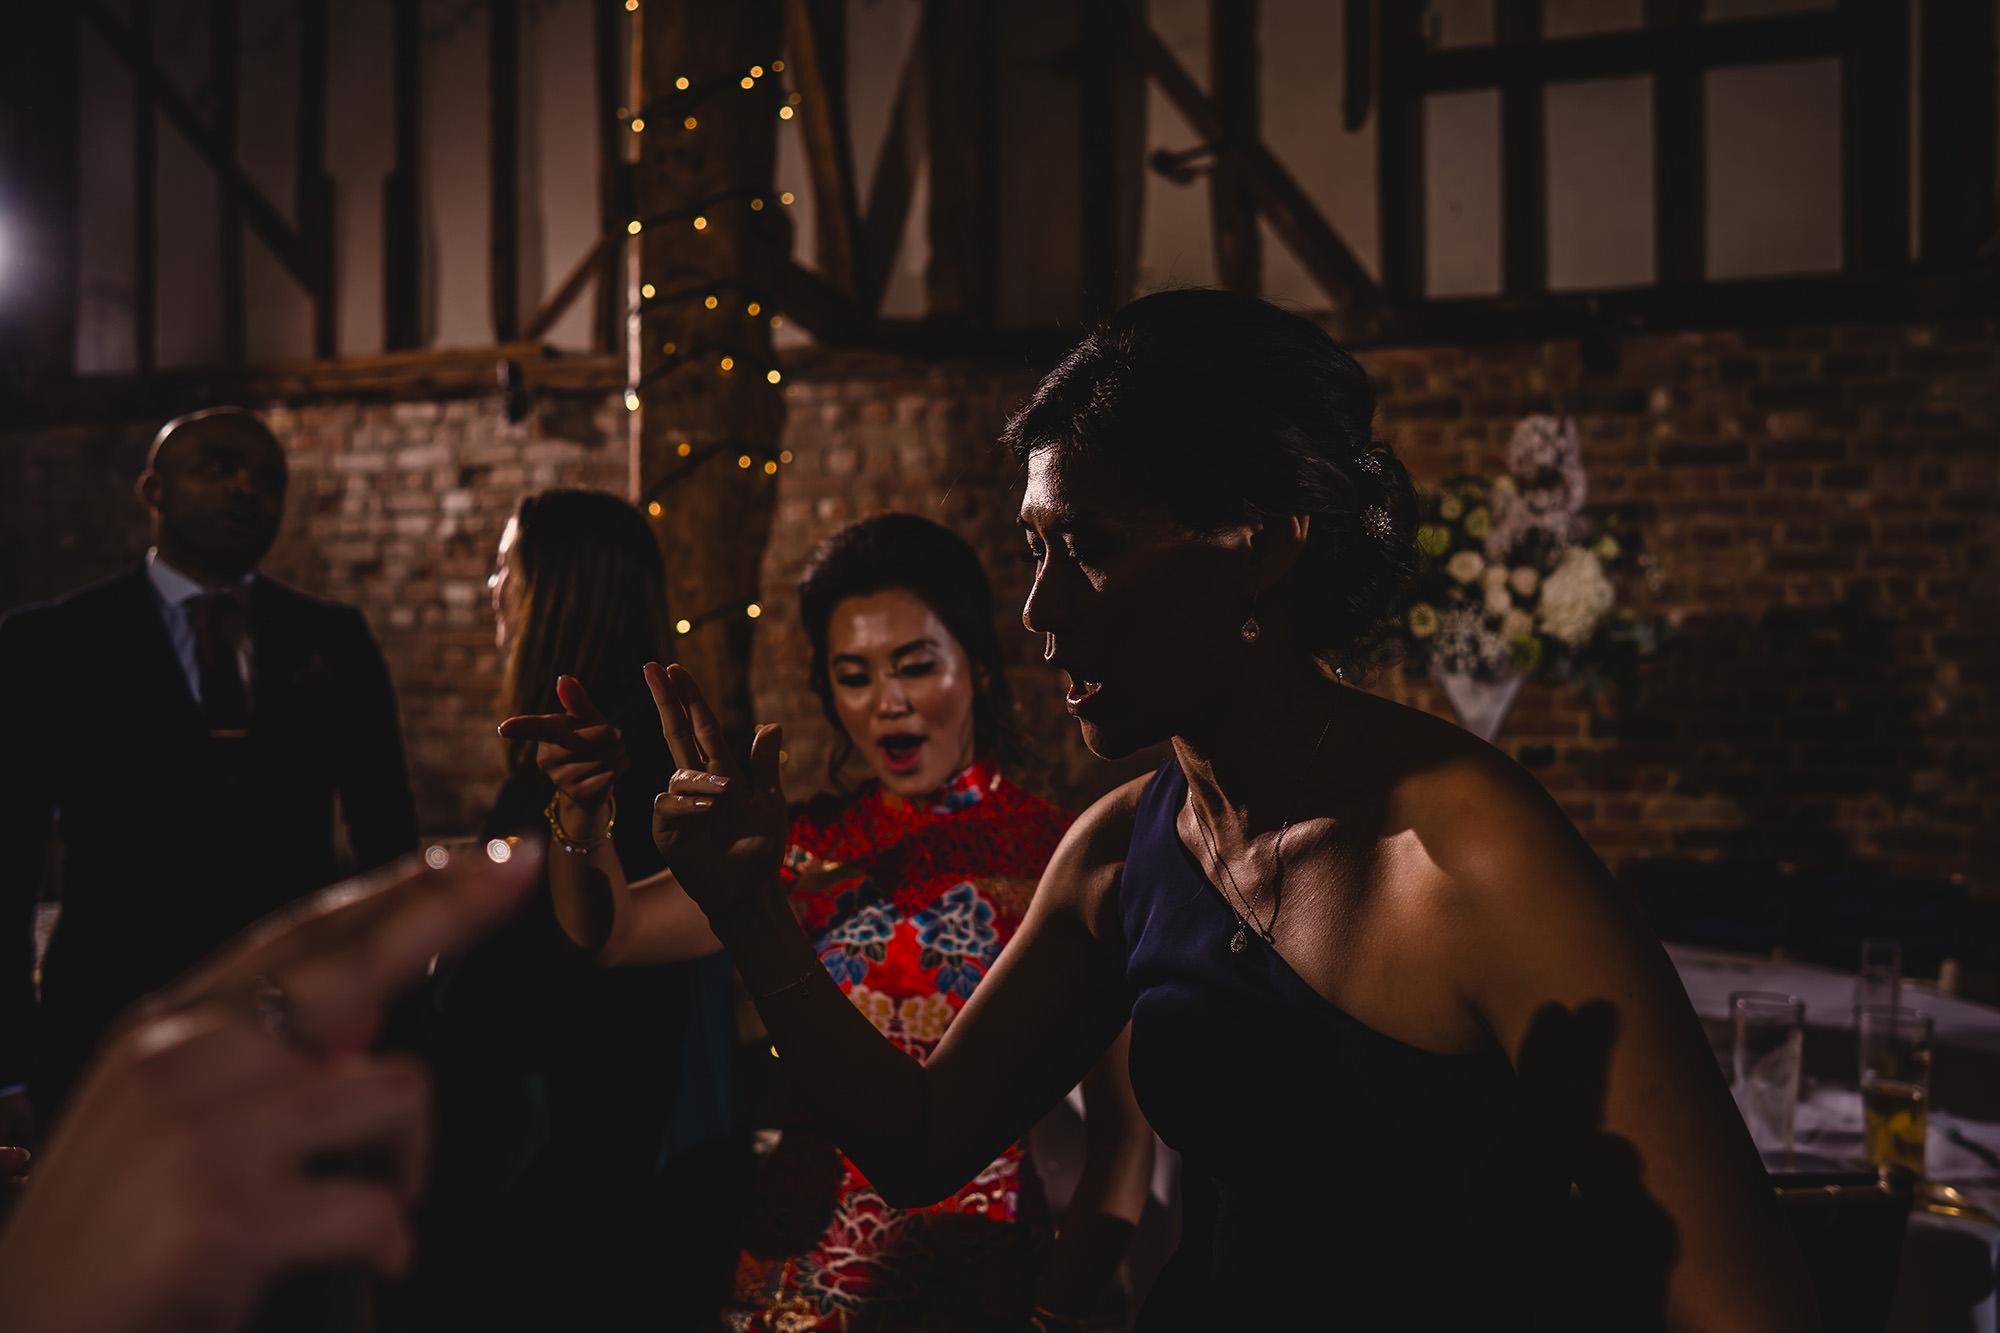 wedding reception party guests dancing